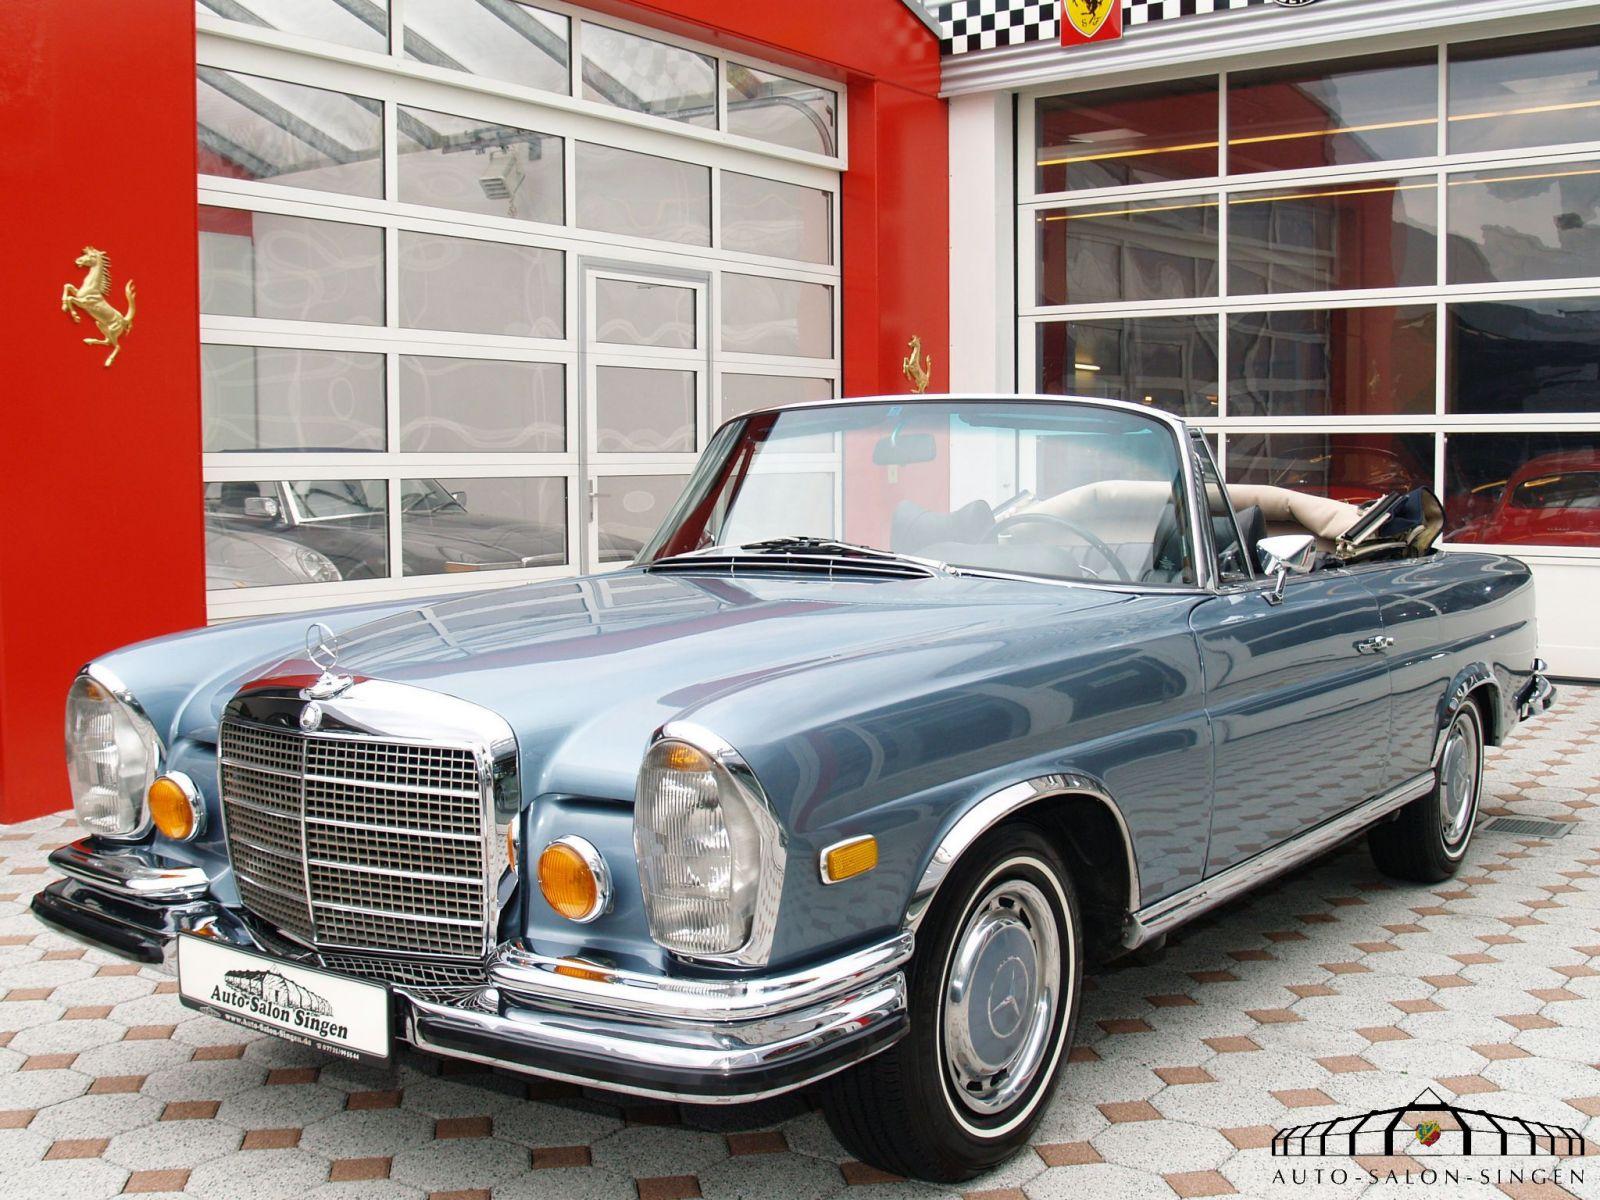 mercedes benz 280 se 3 5 cabrio convertible auto salon. Black Bedroom Furniture Sets. Home Design Ideas